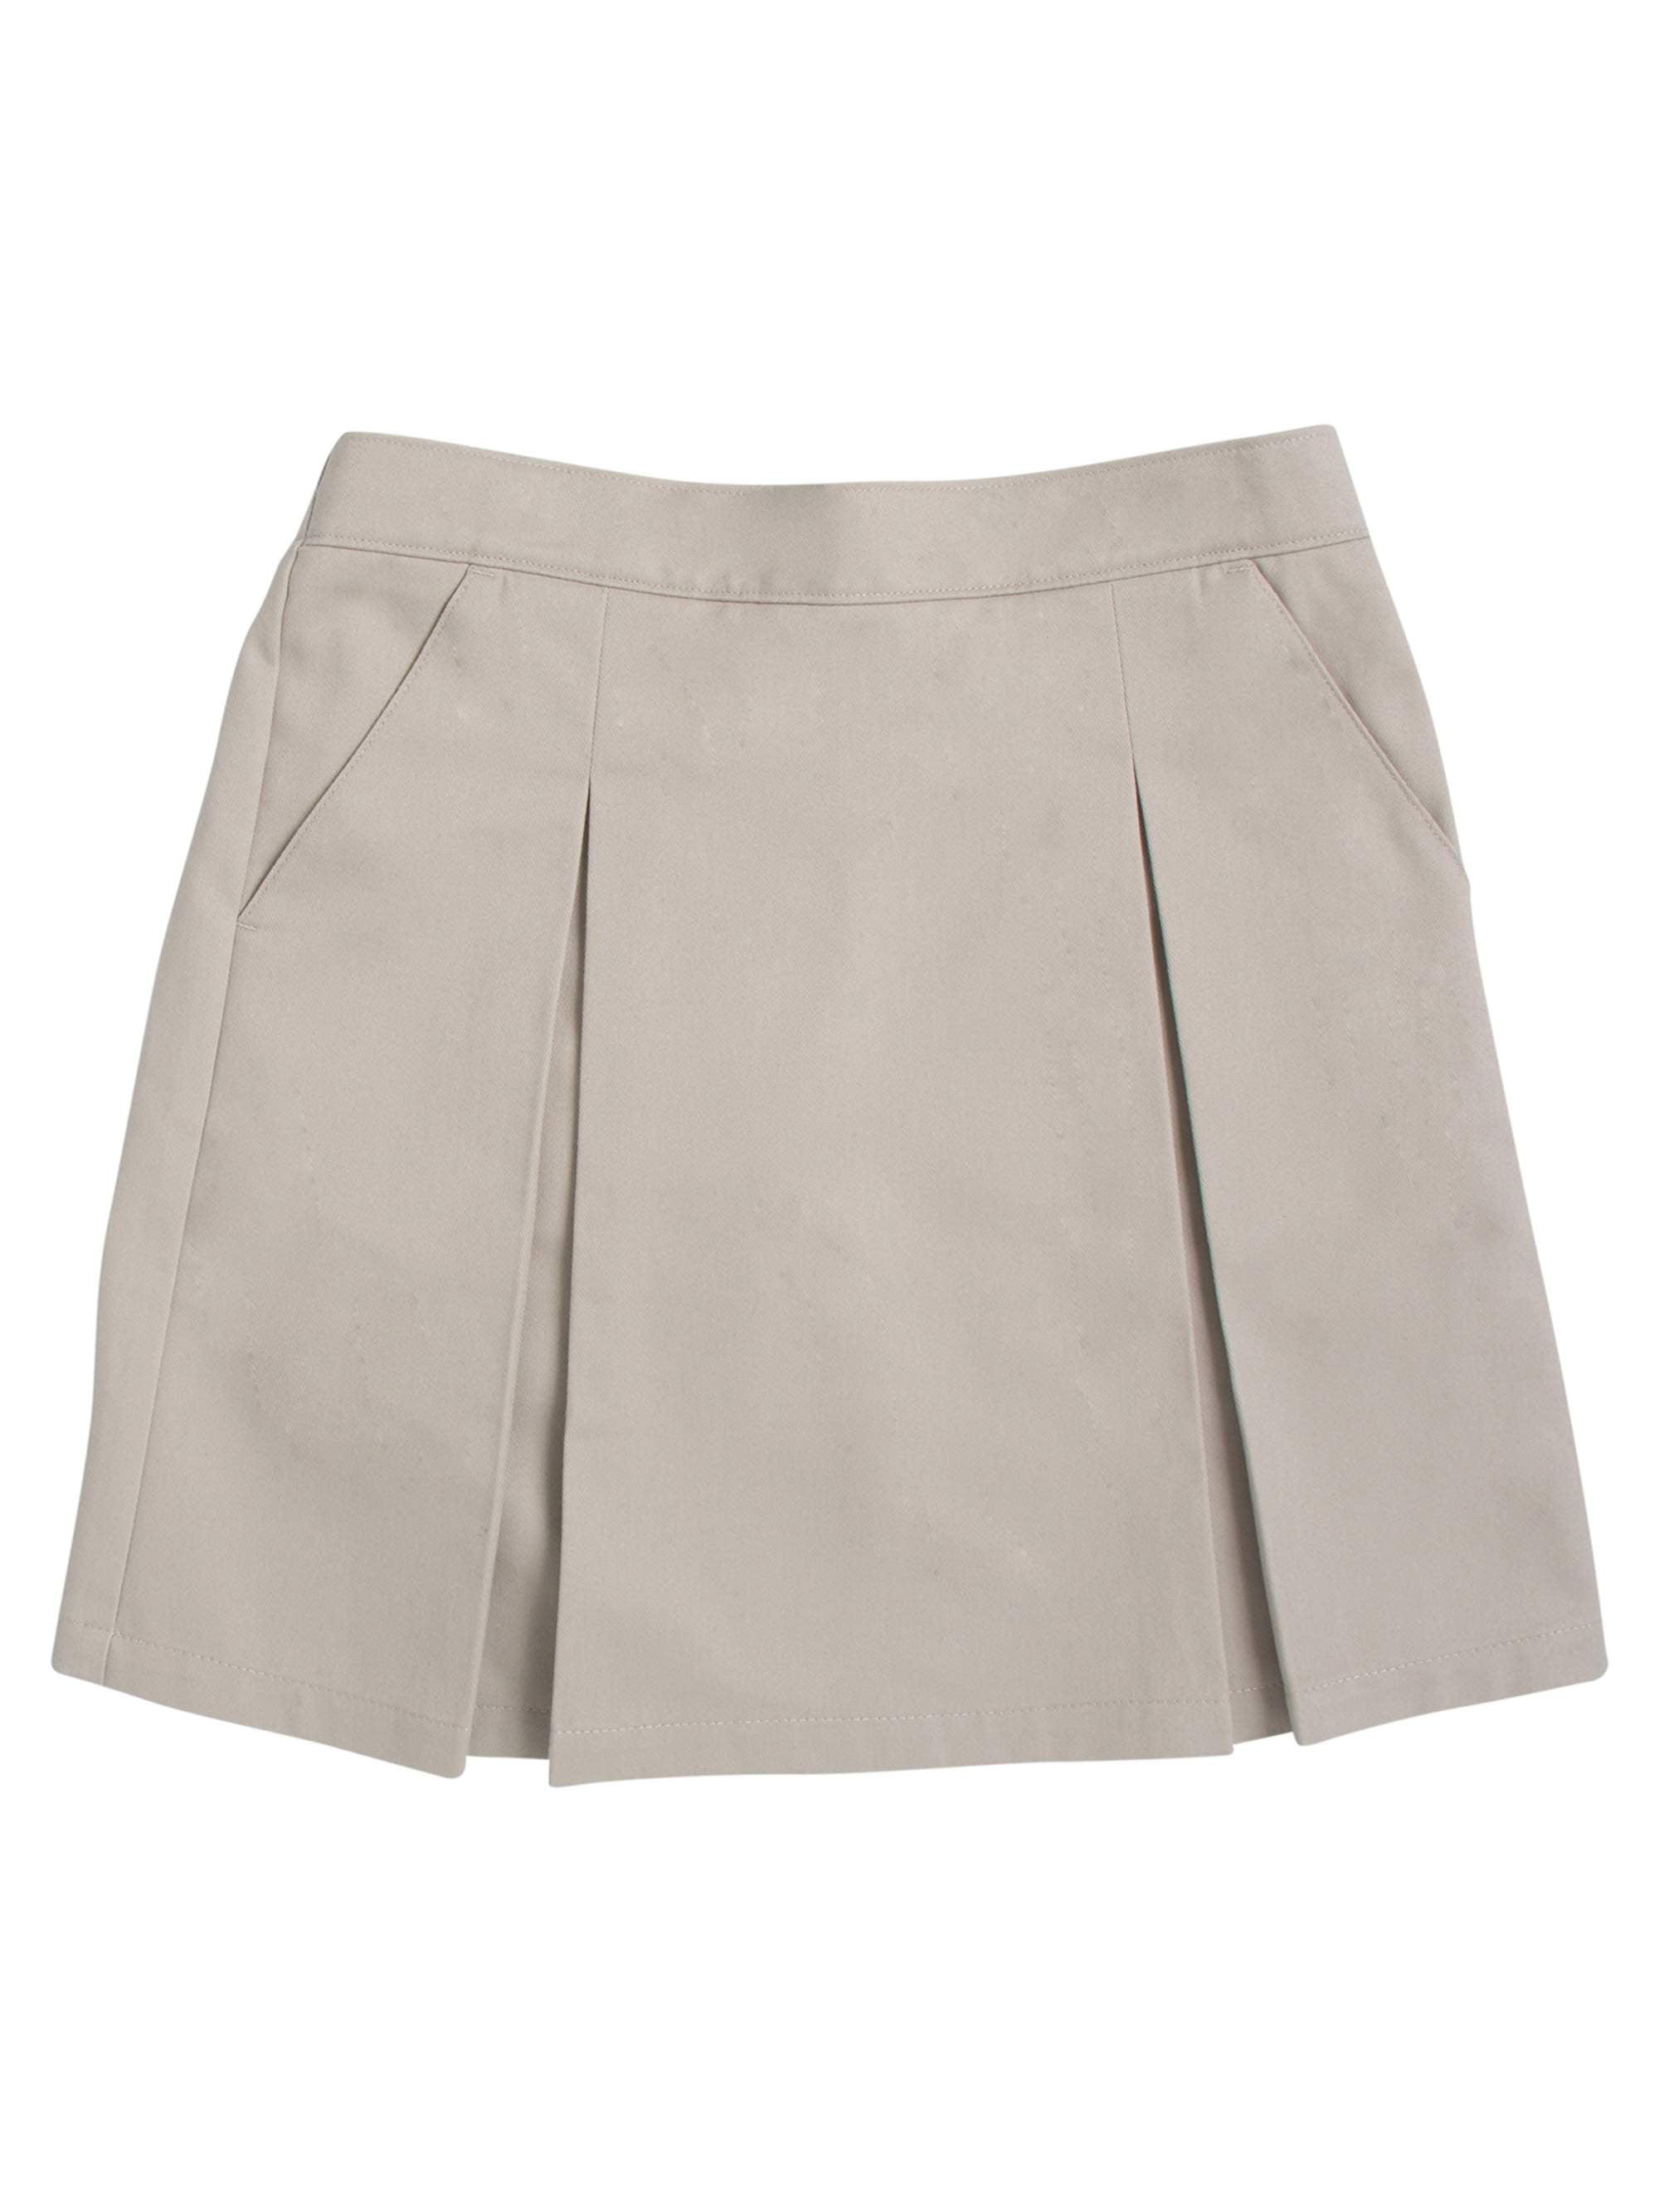 Girls' PLUS School Uniform Twill Scooter with Pockets